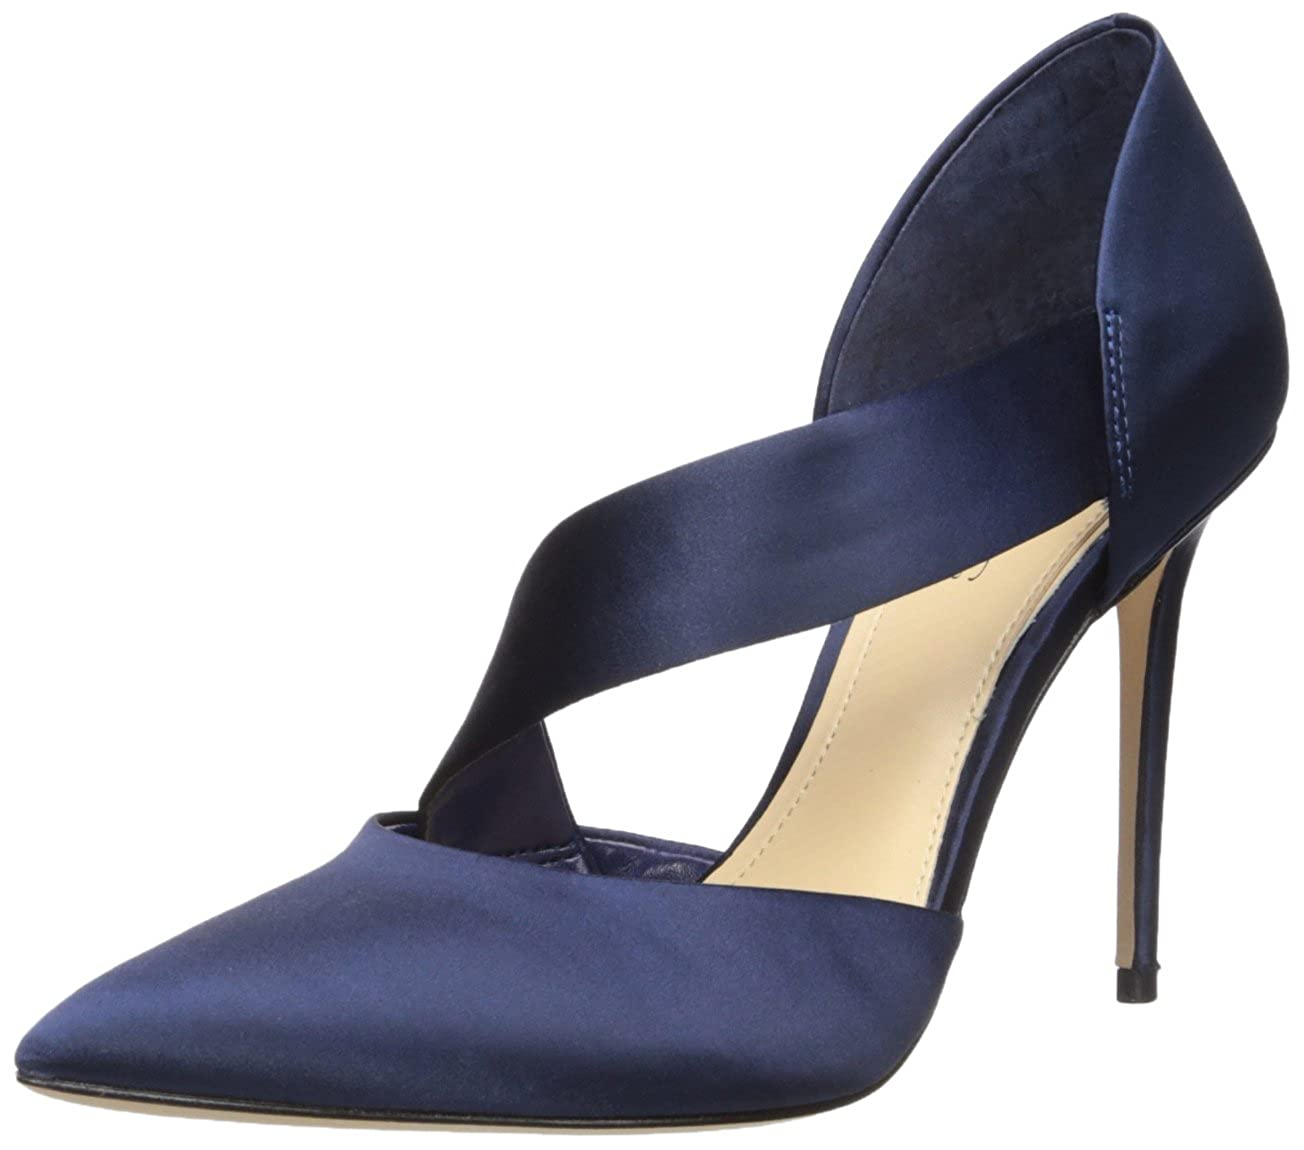 Medium bluee 01 Vince Camuto Imagine Women's OYA Pump